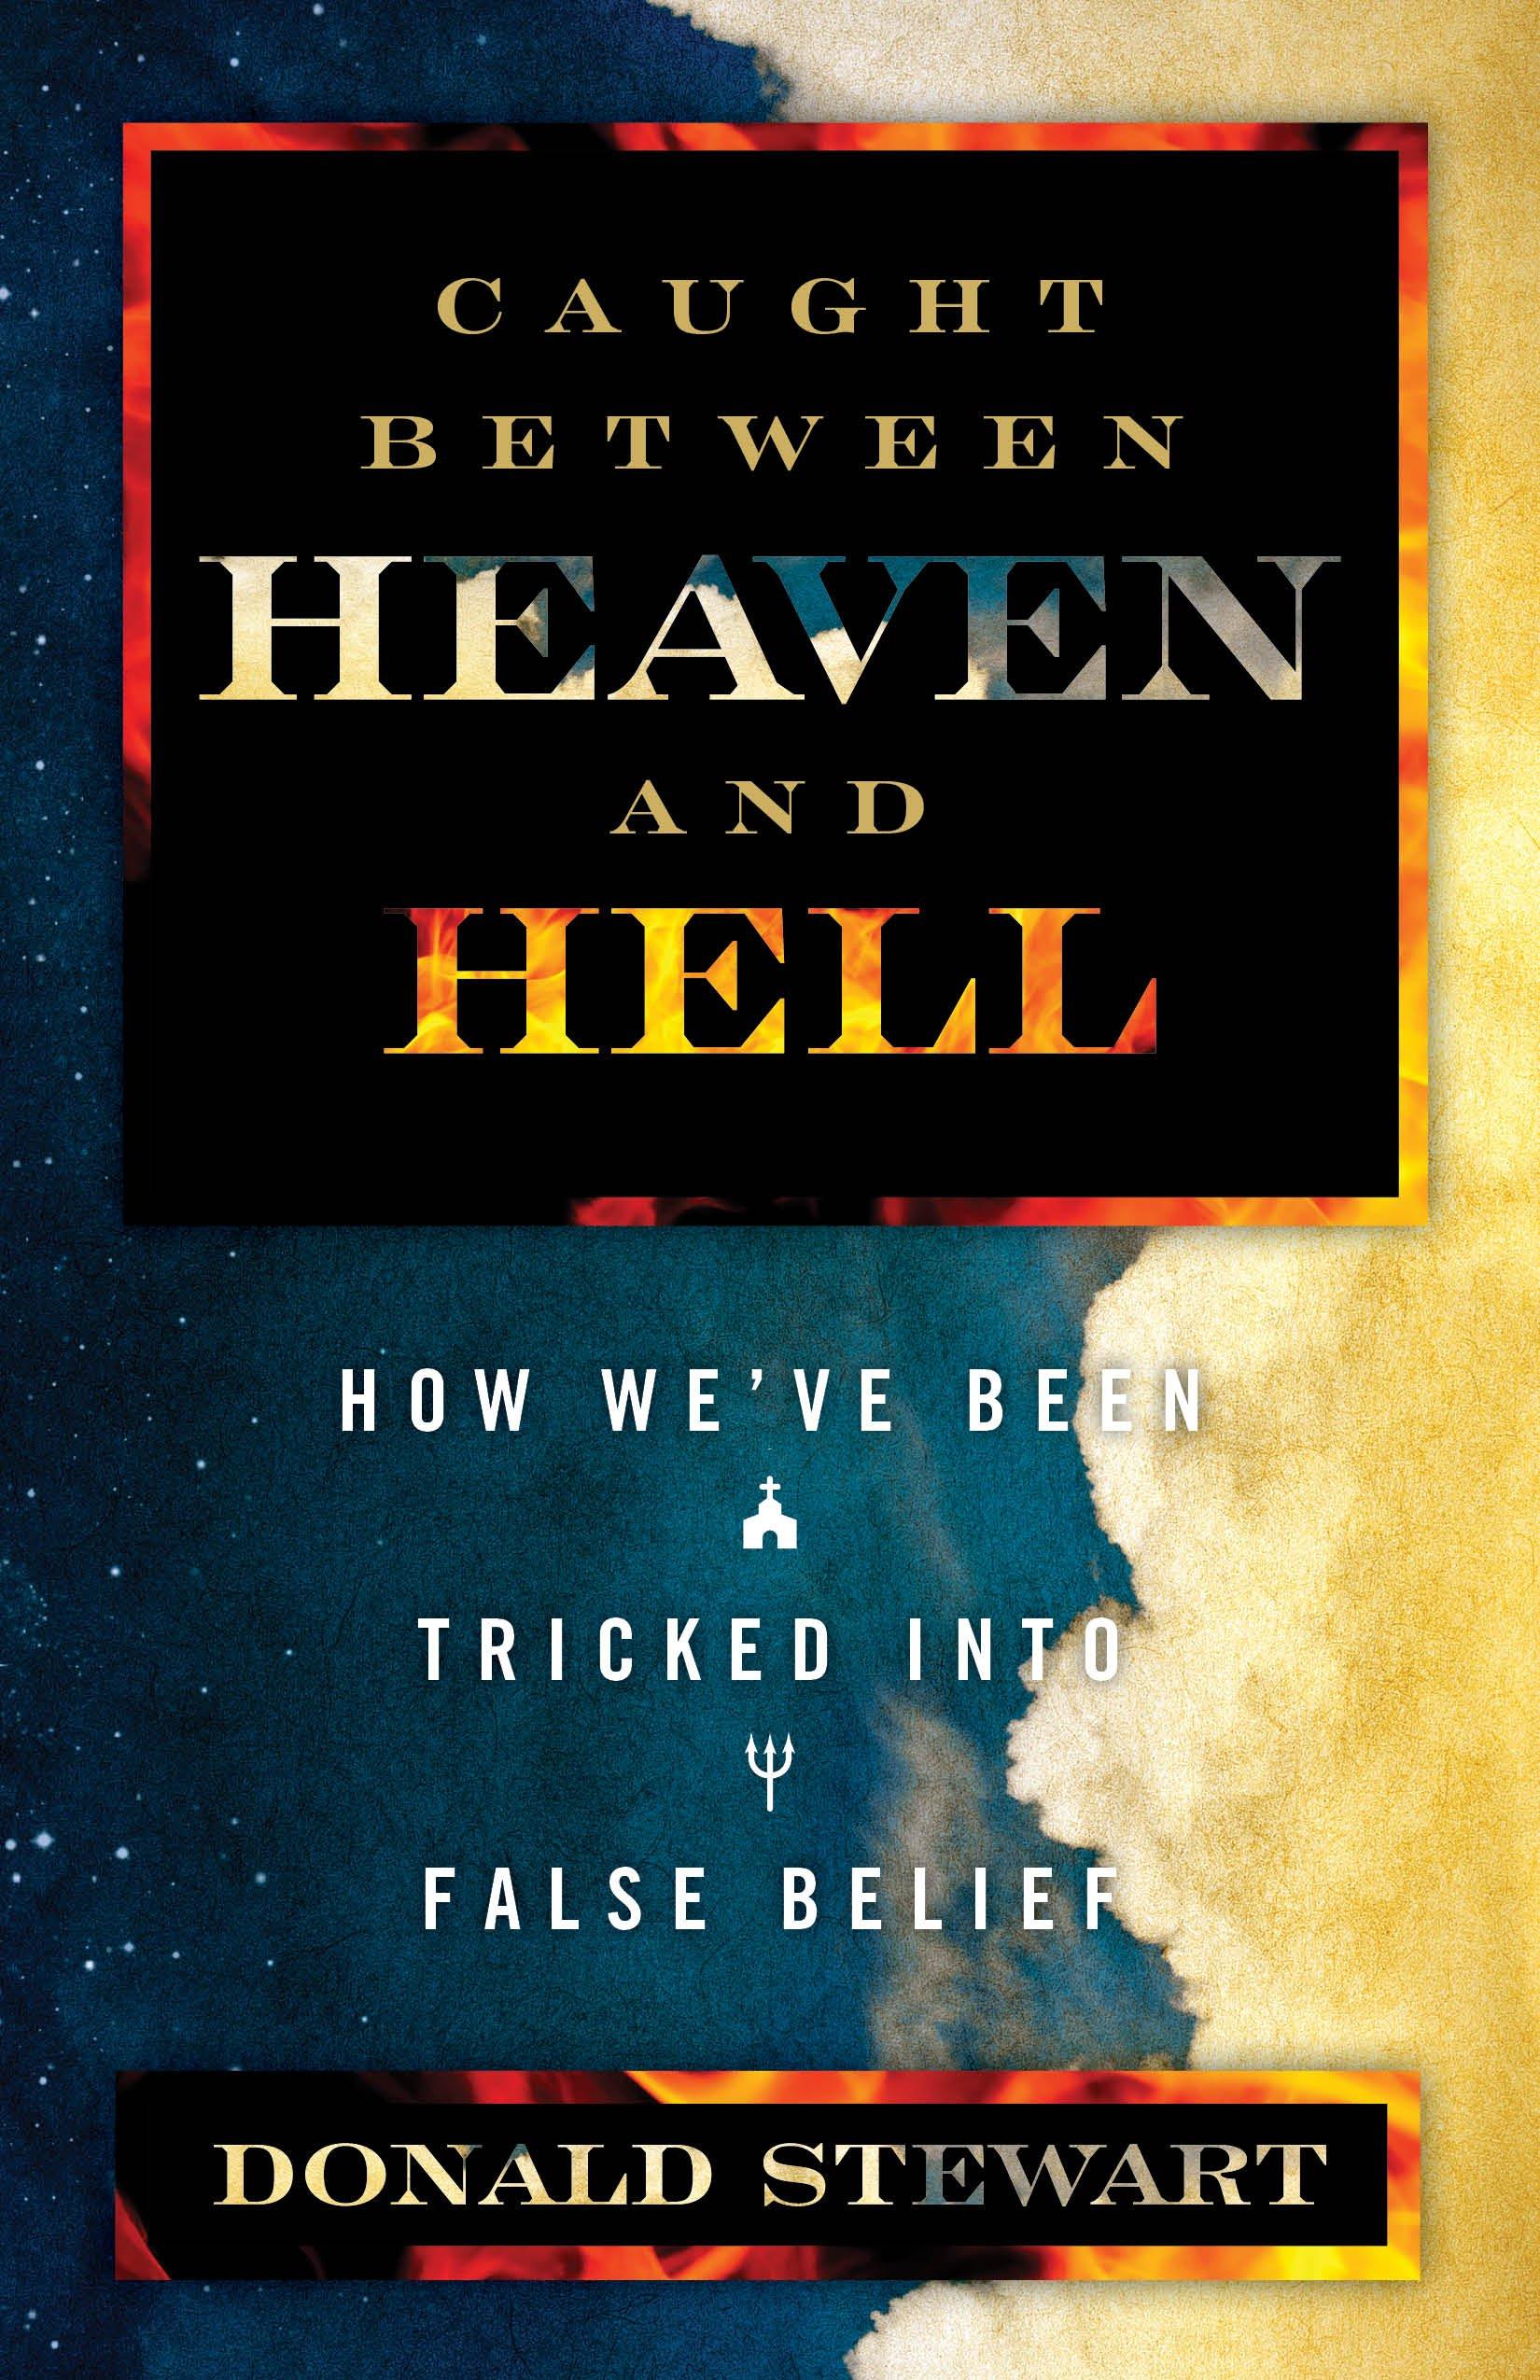 Download Caught Between Heaven and Hell: How We've Been Tricked in False Belief PDF